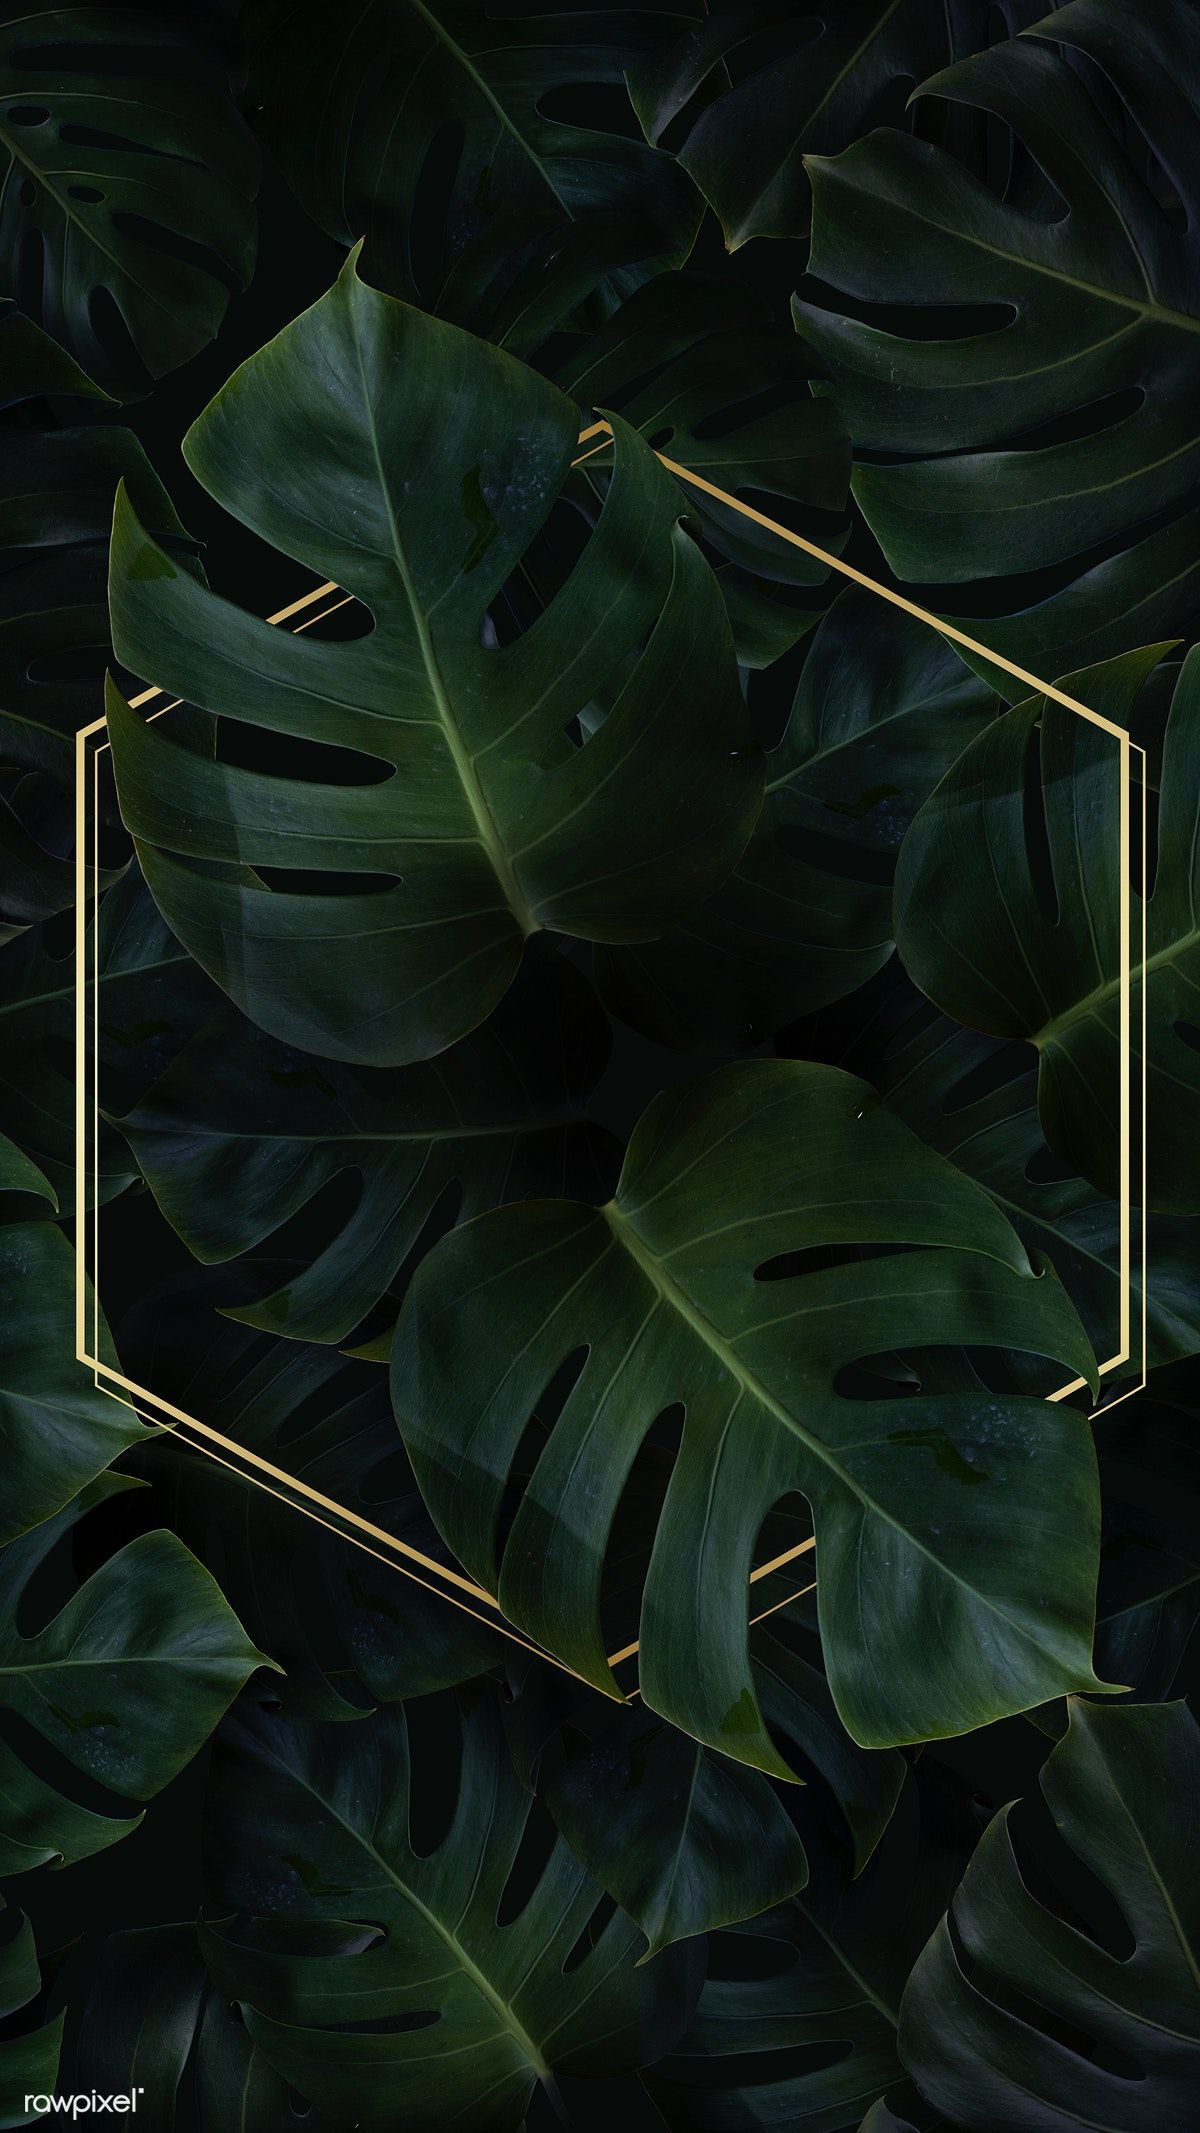 Download premium psd of Hexagon golden frame on a tropical